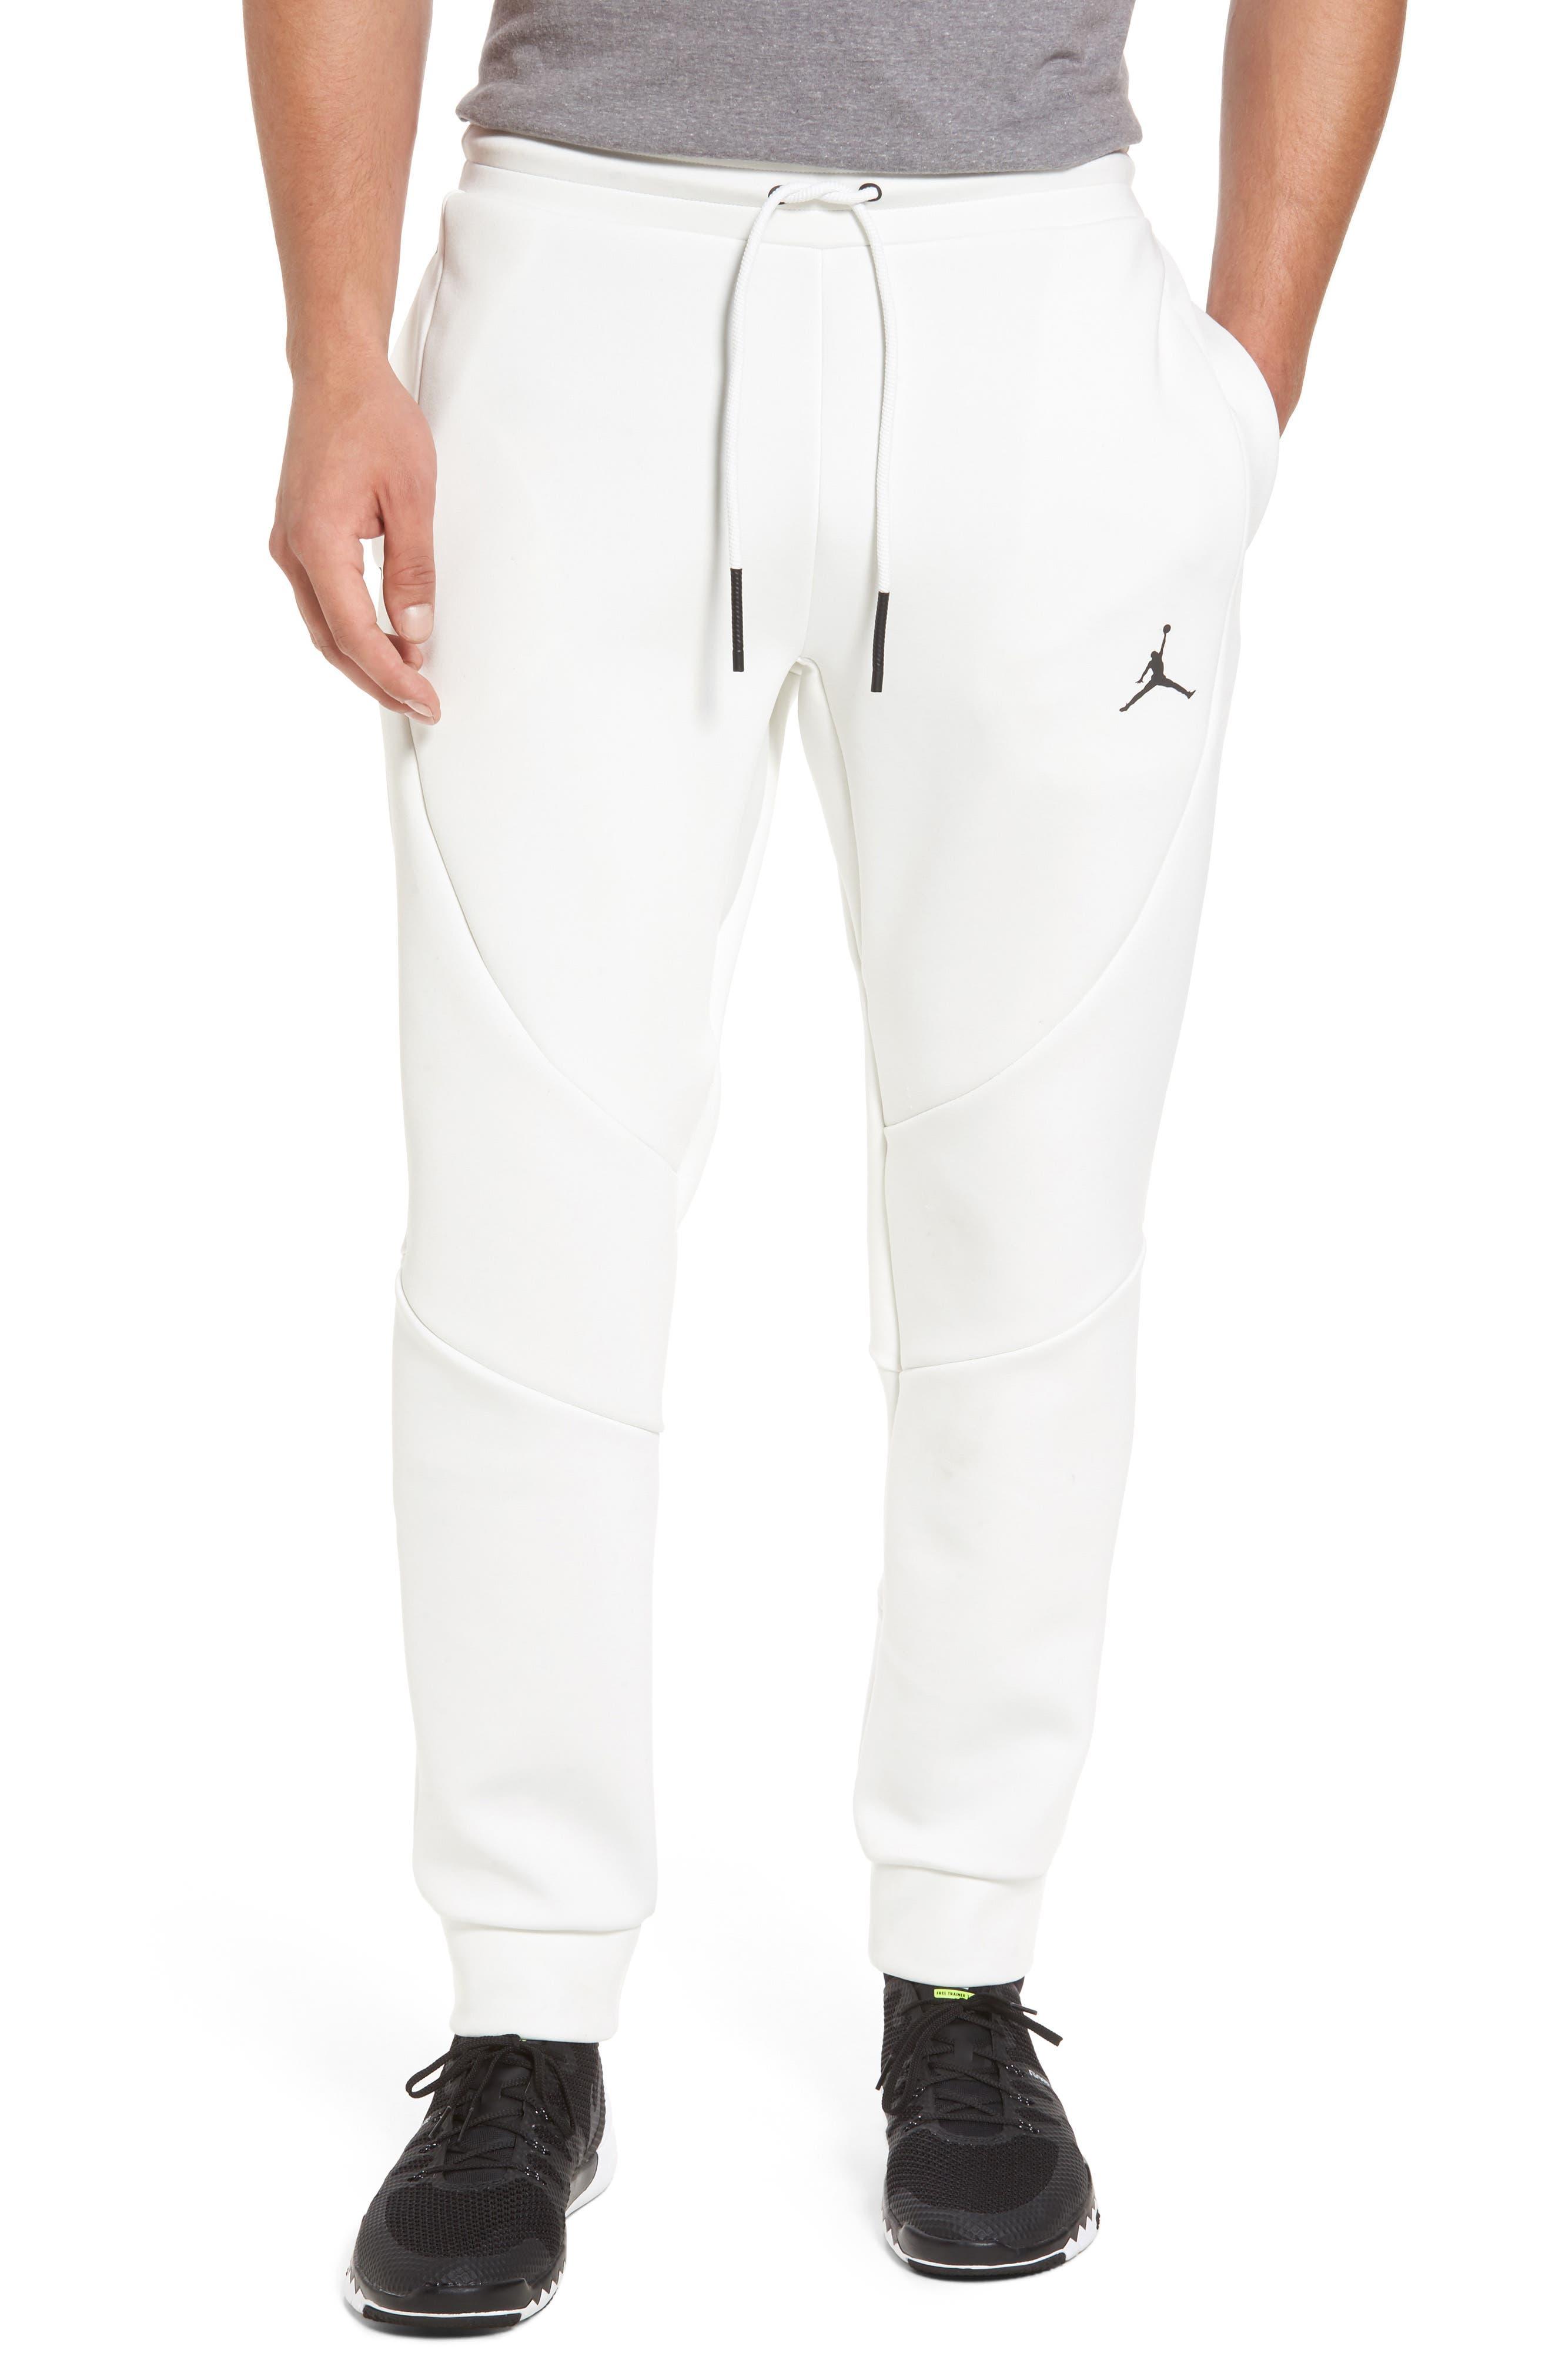 Sportswear Flight Tech Pants,                             Main thumbnail 1, color,                             Summit White/ Black